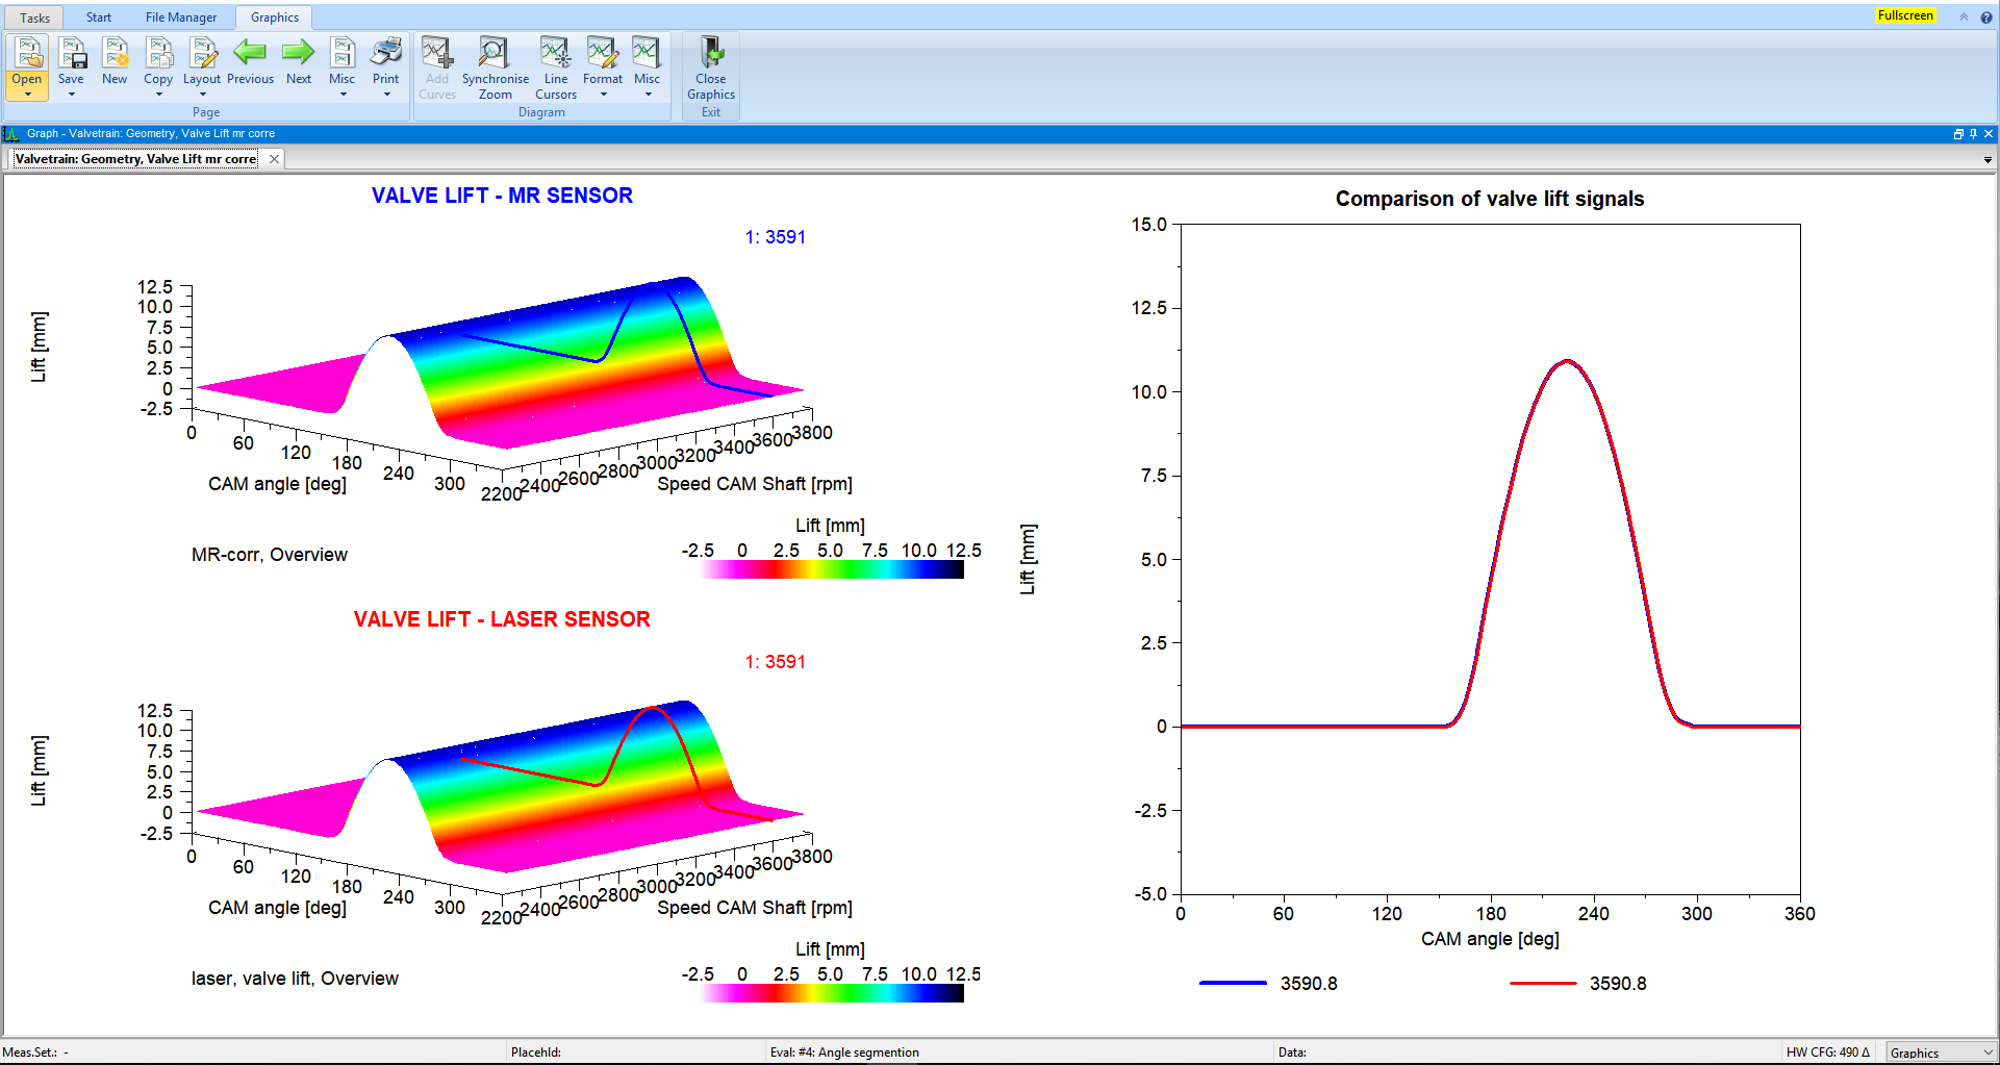 Ventiltrieb Vergleich MR Sensor/Laser Sensor